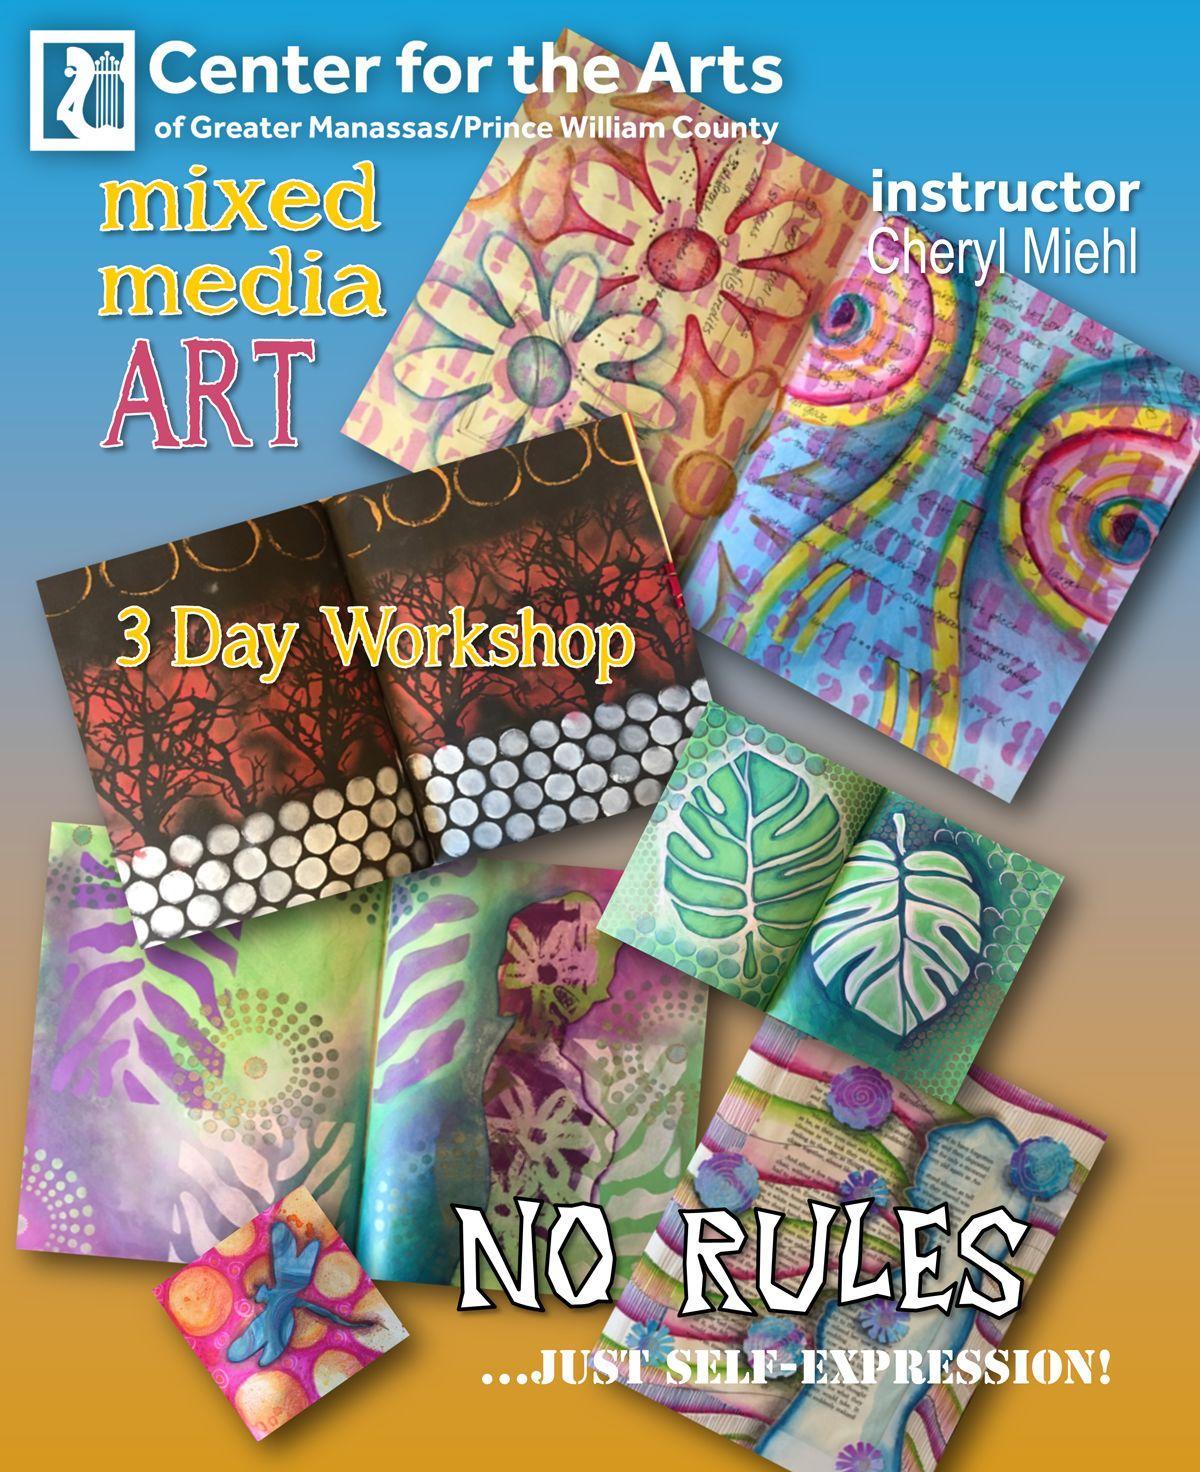 Vibrant mixed media class with artist Cheryl Miehl